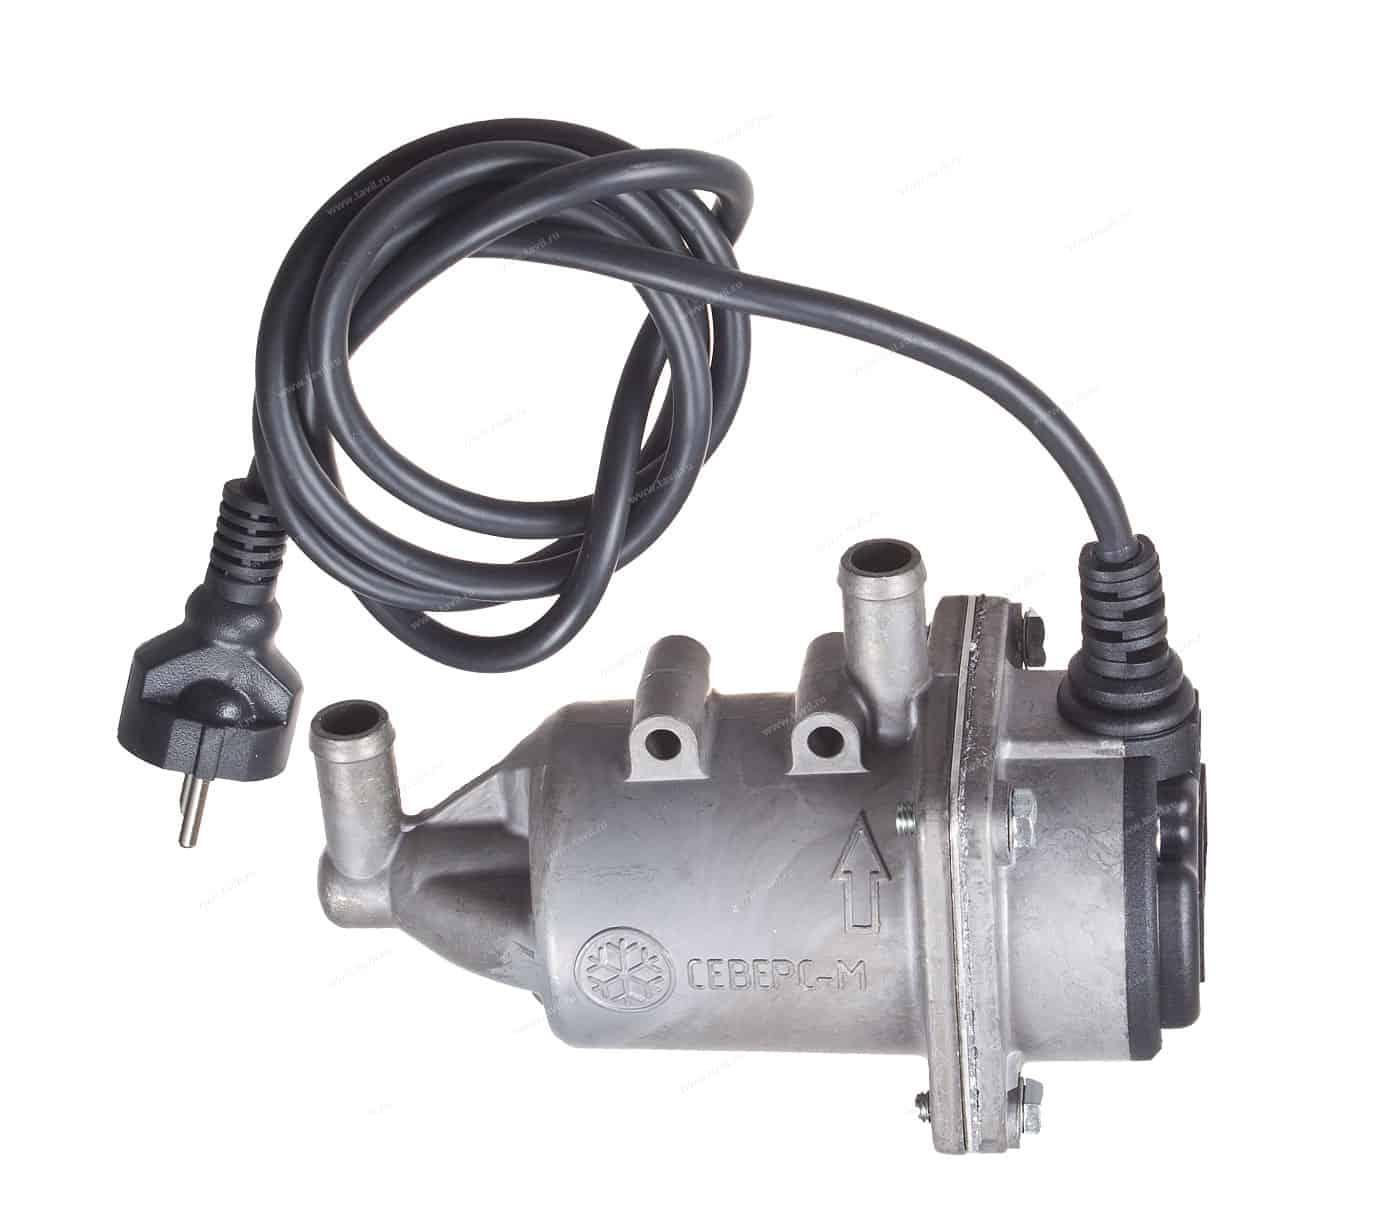 Incalzitor pe apa Binar 5S cu panou comanda PU27, 12V, pe motorina - tvexpert.ro